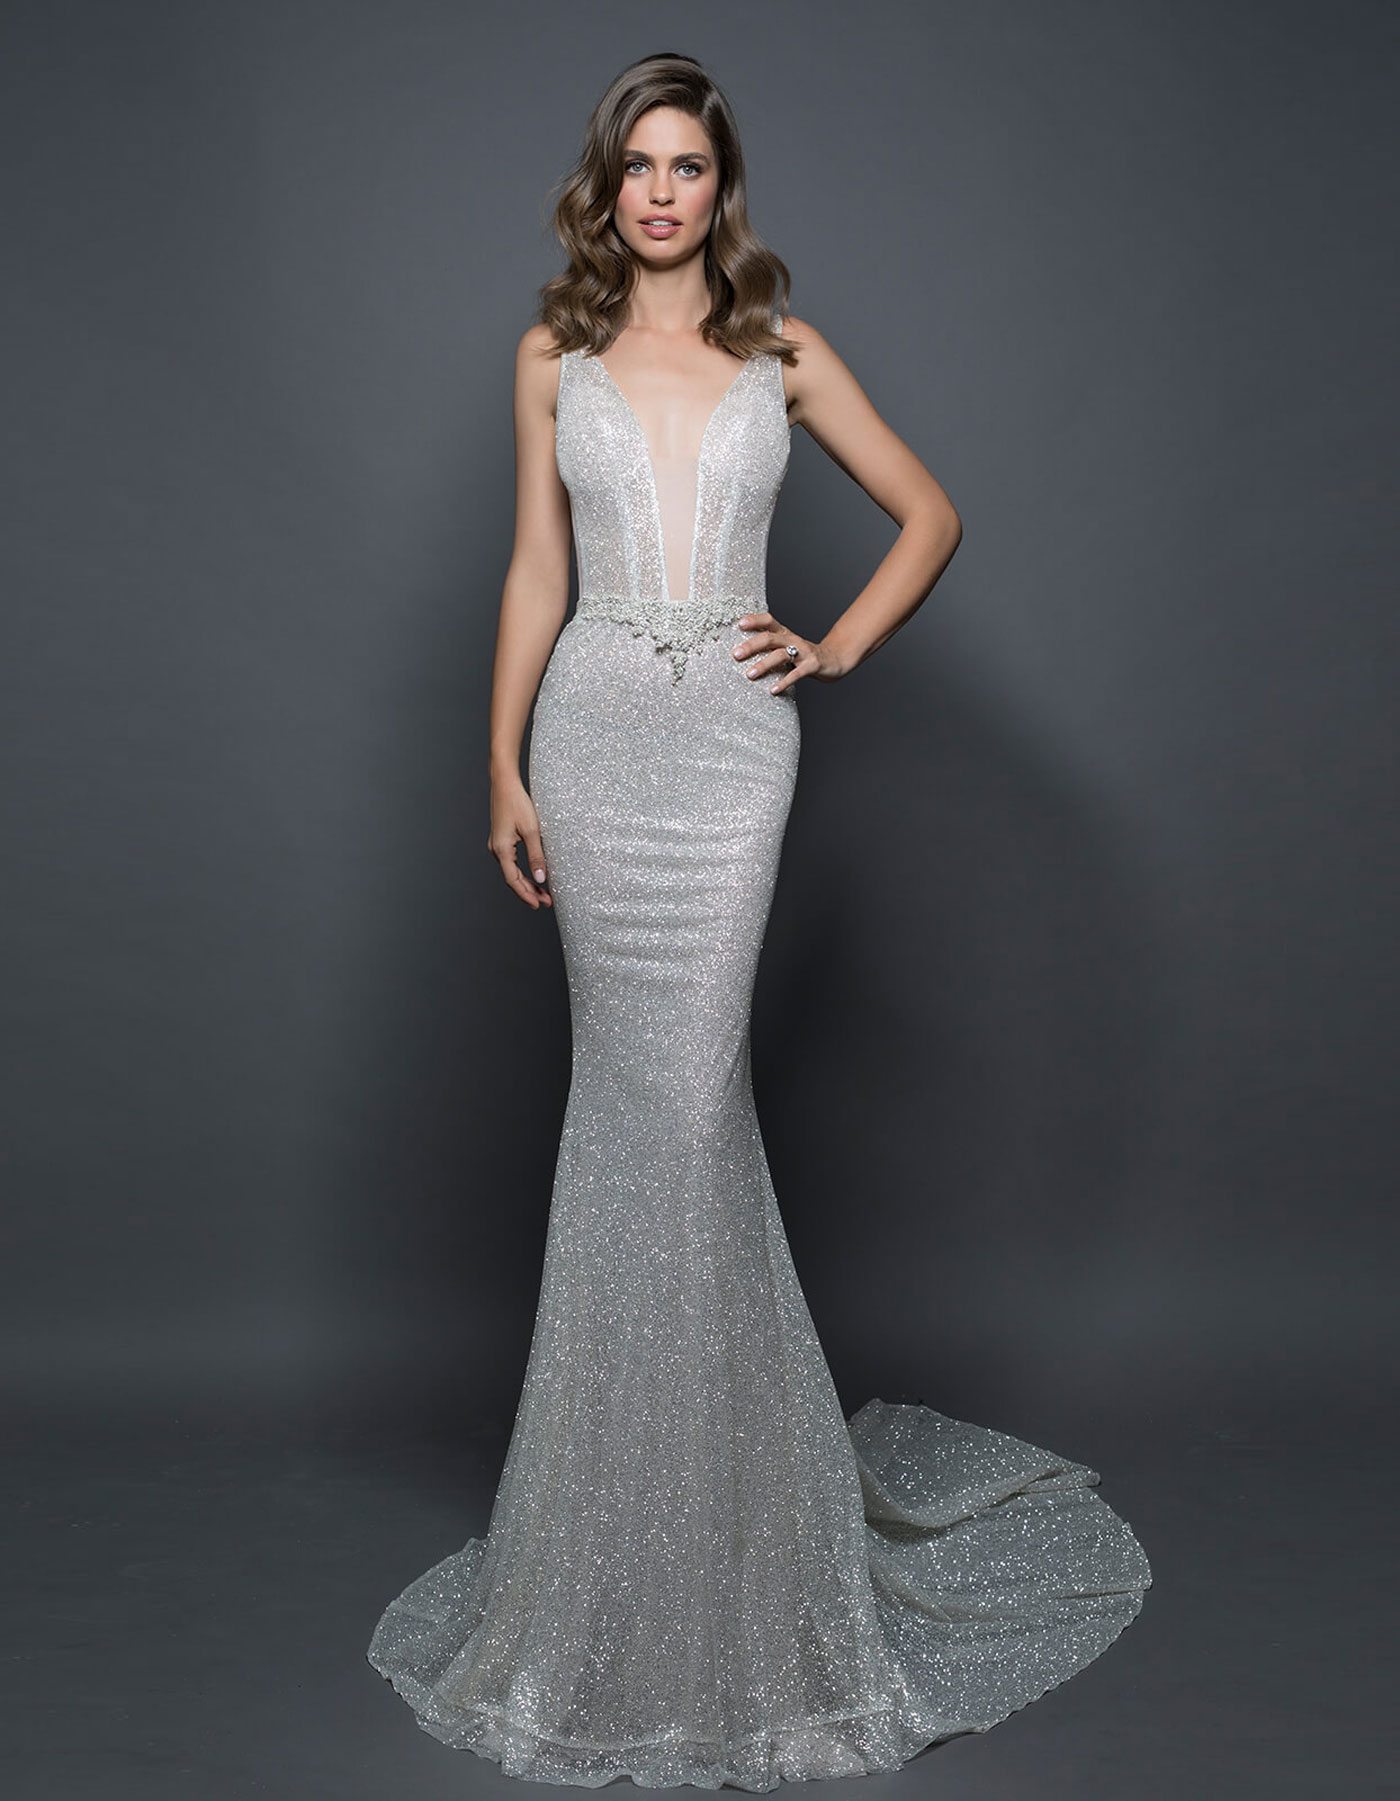 Glitter Wedding Dress With Overskirt 14584 By Pnina Tornai